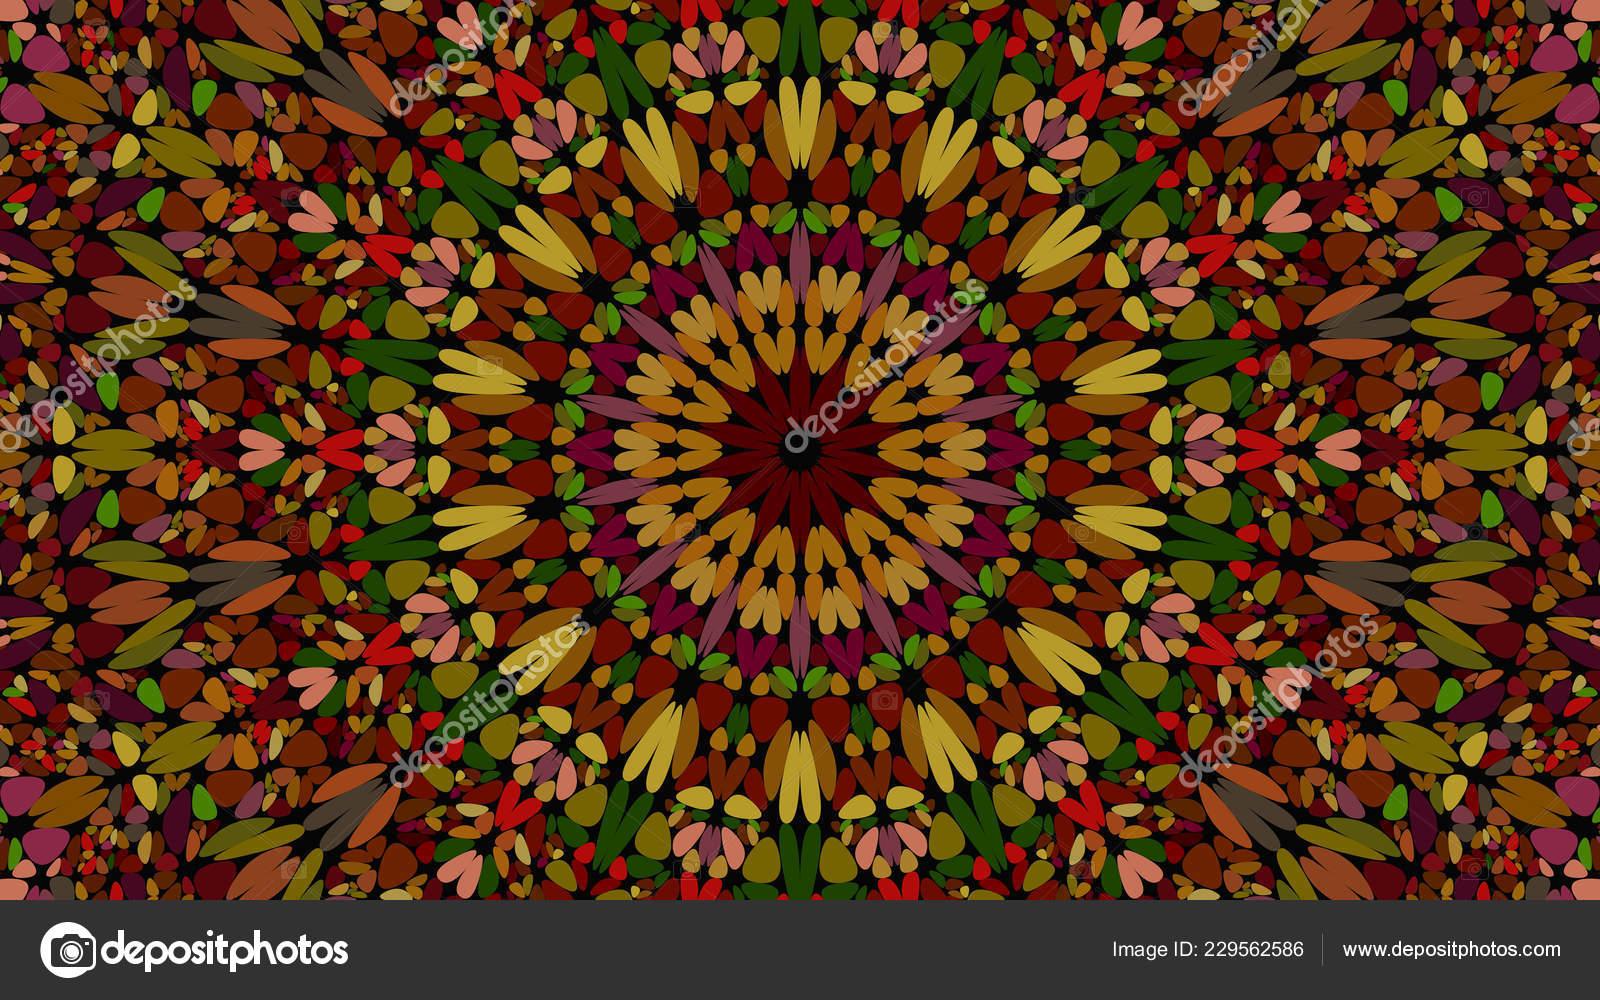 Mandala Desktop Wallpaper Colorful Abstract Floral Kaleidoscope